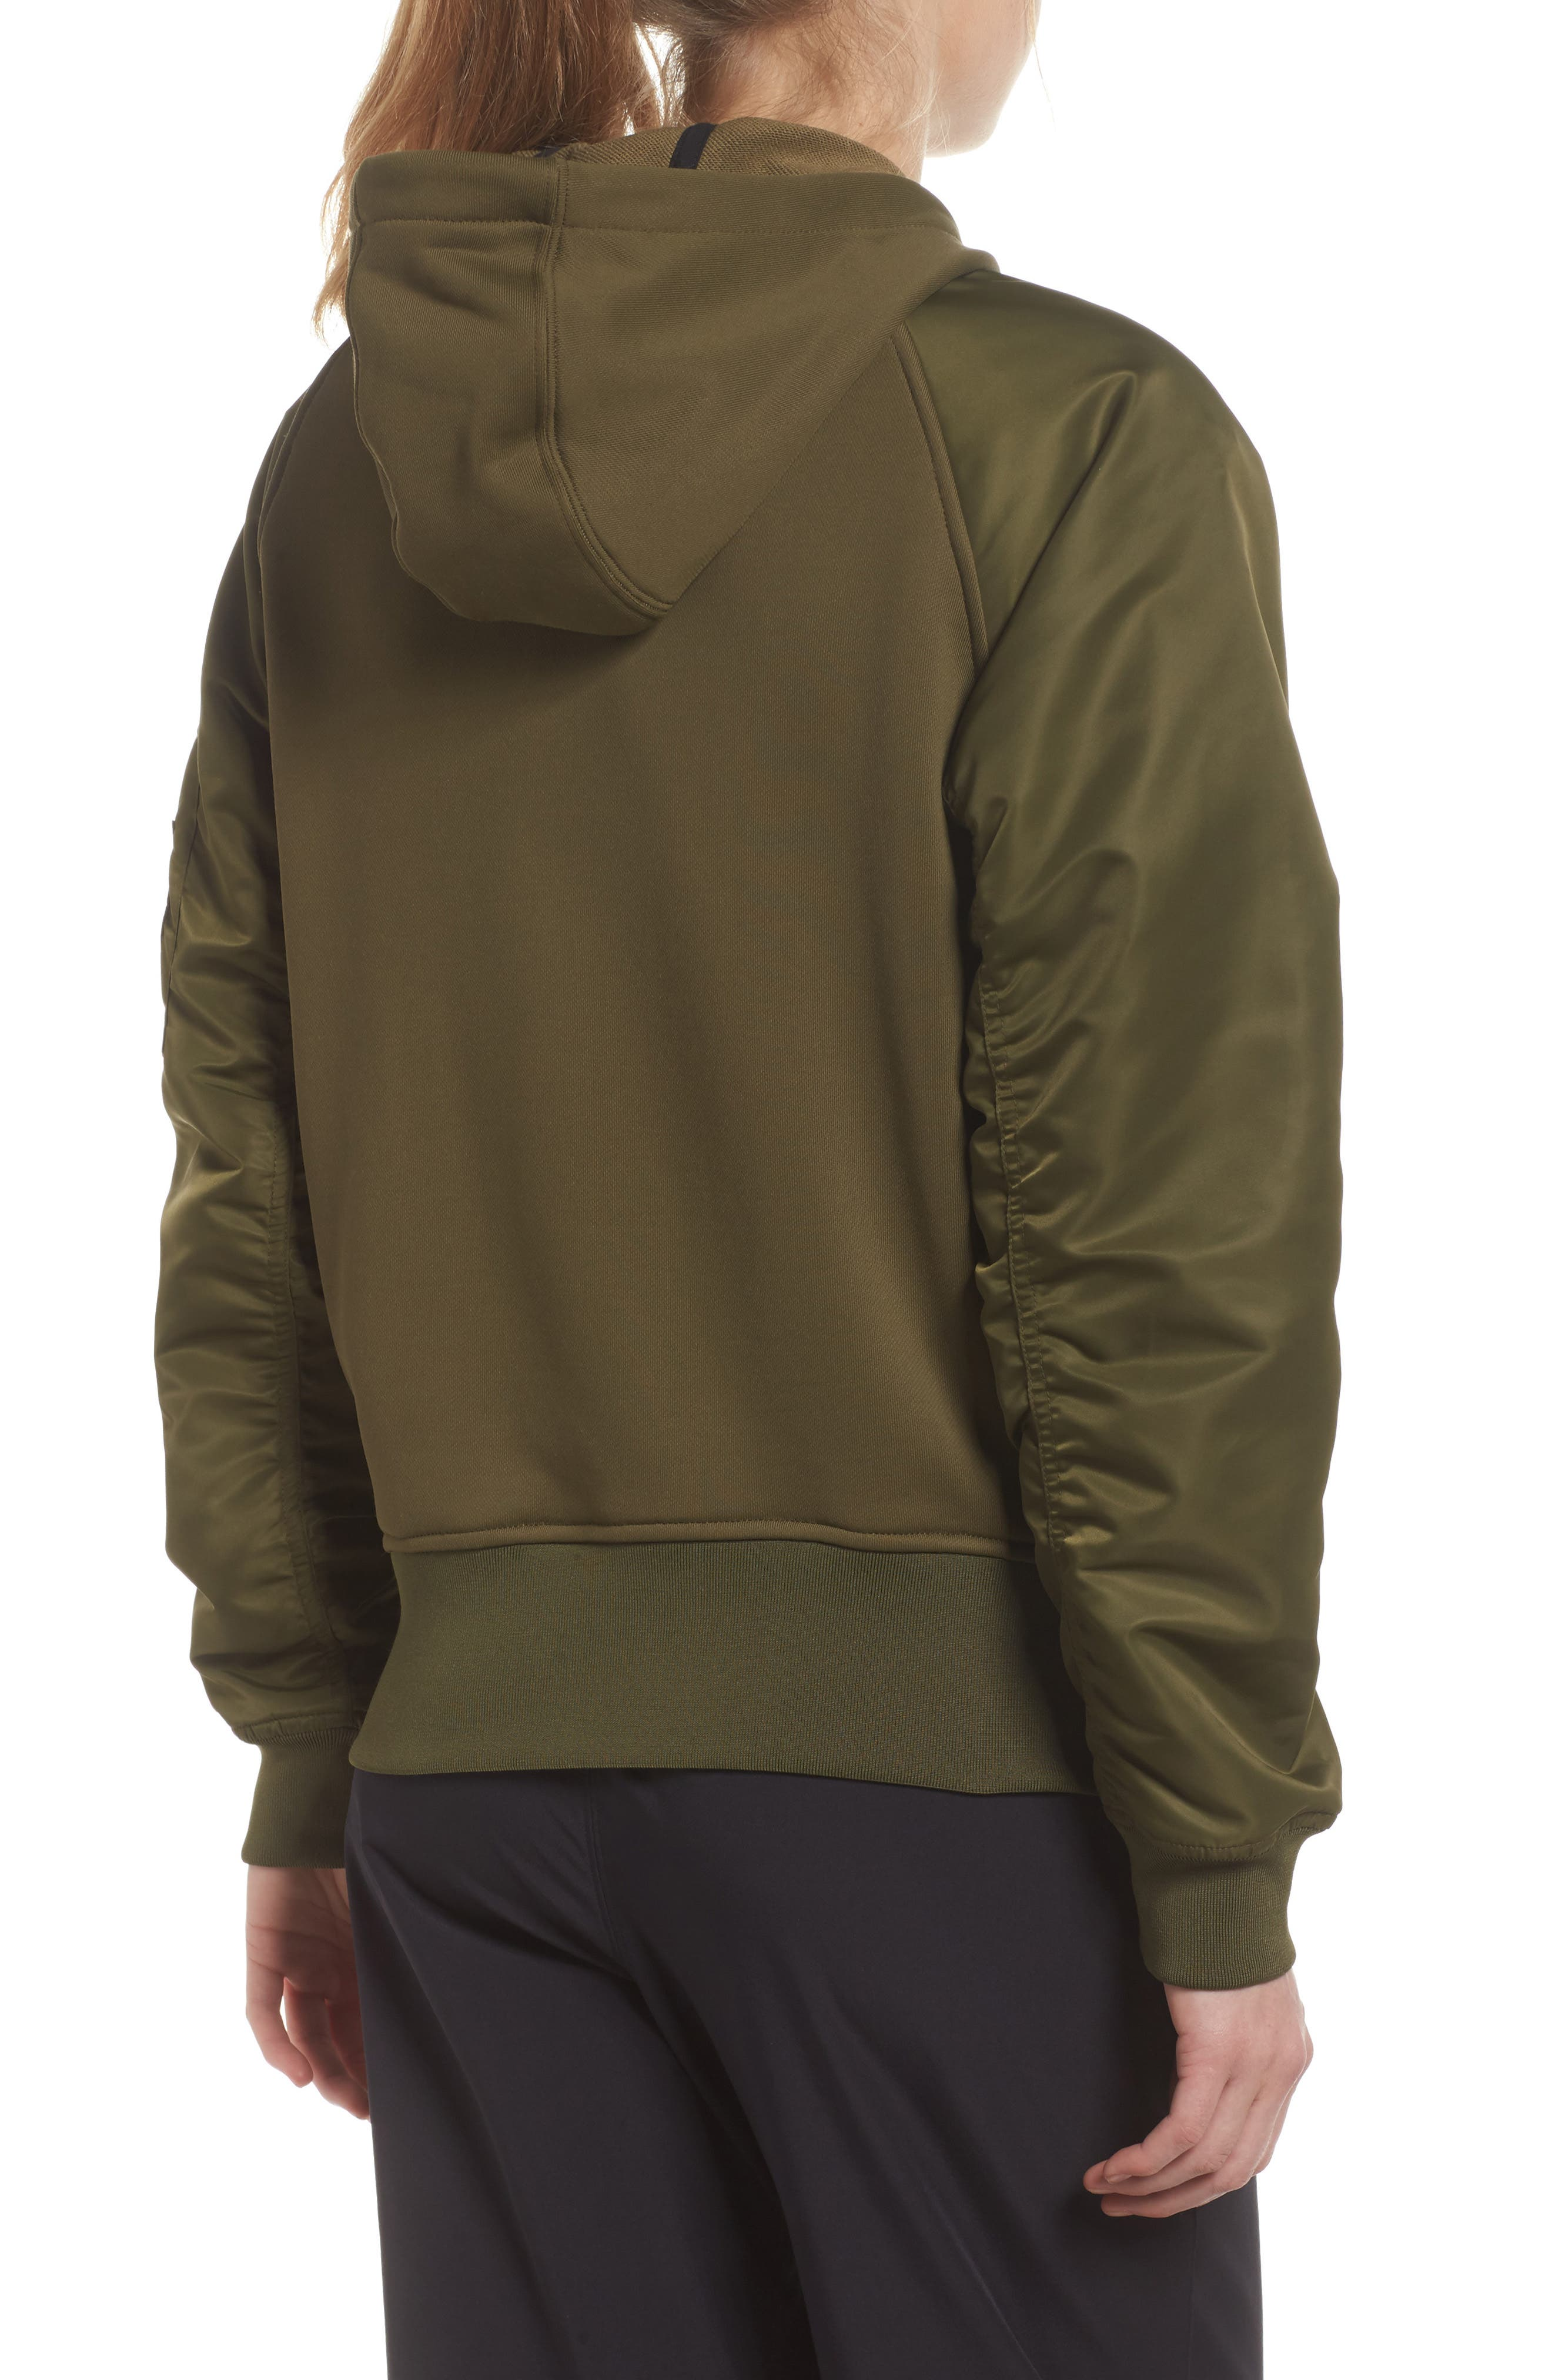 NikeLab Women's Mixed Media Bomber Jacket,                             Alternate thumbnail 3, color,